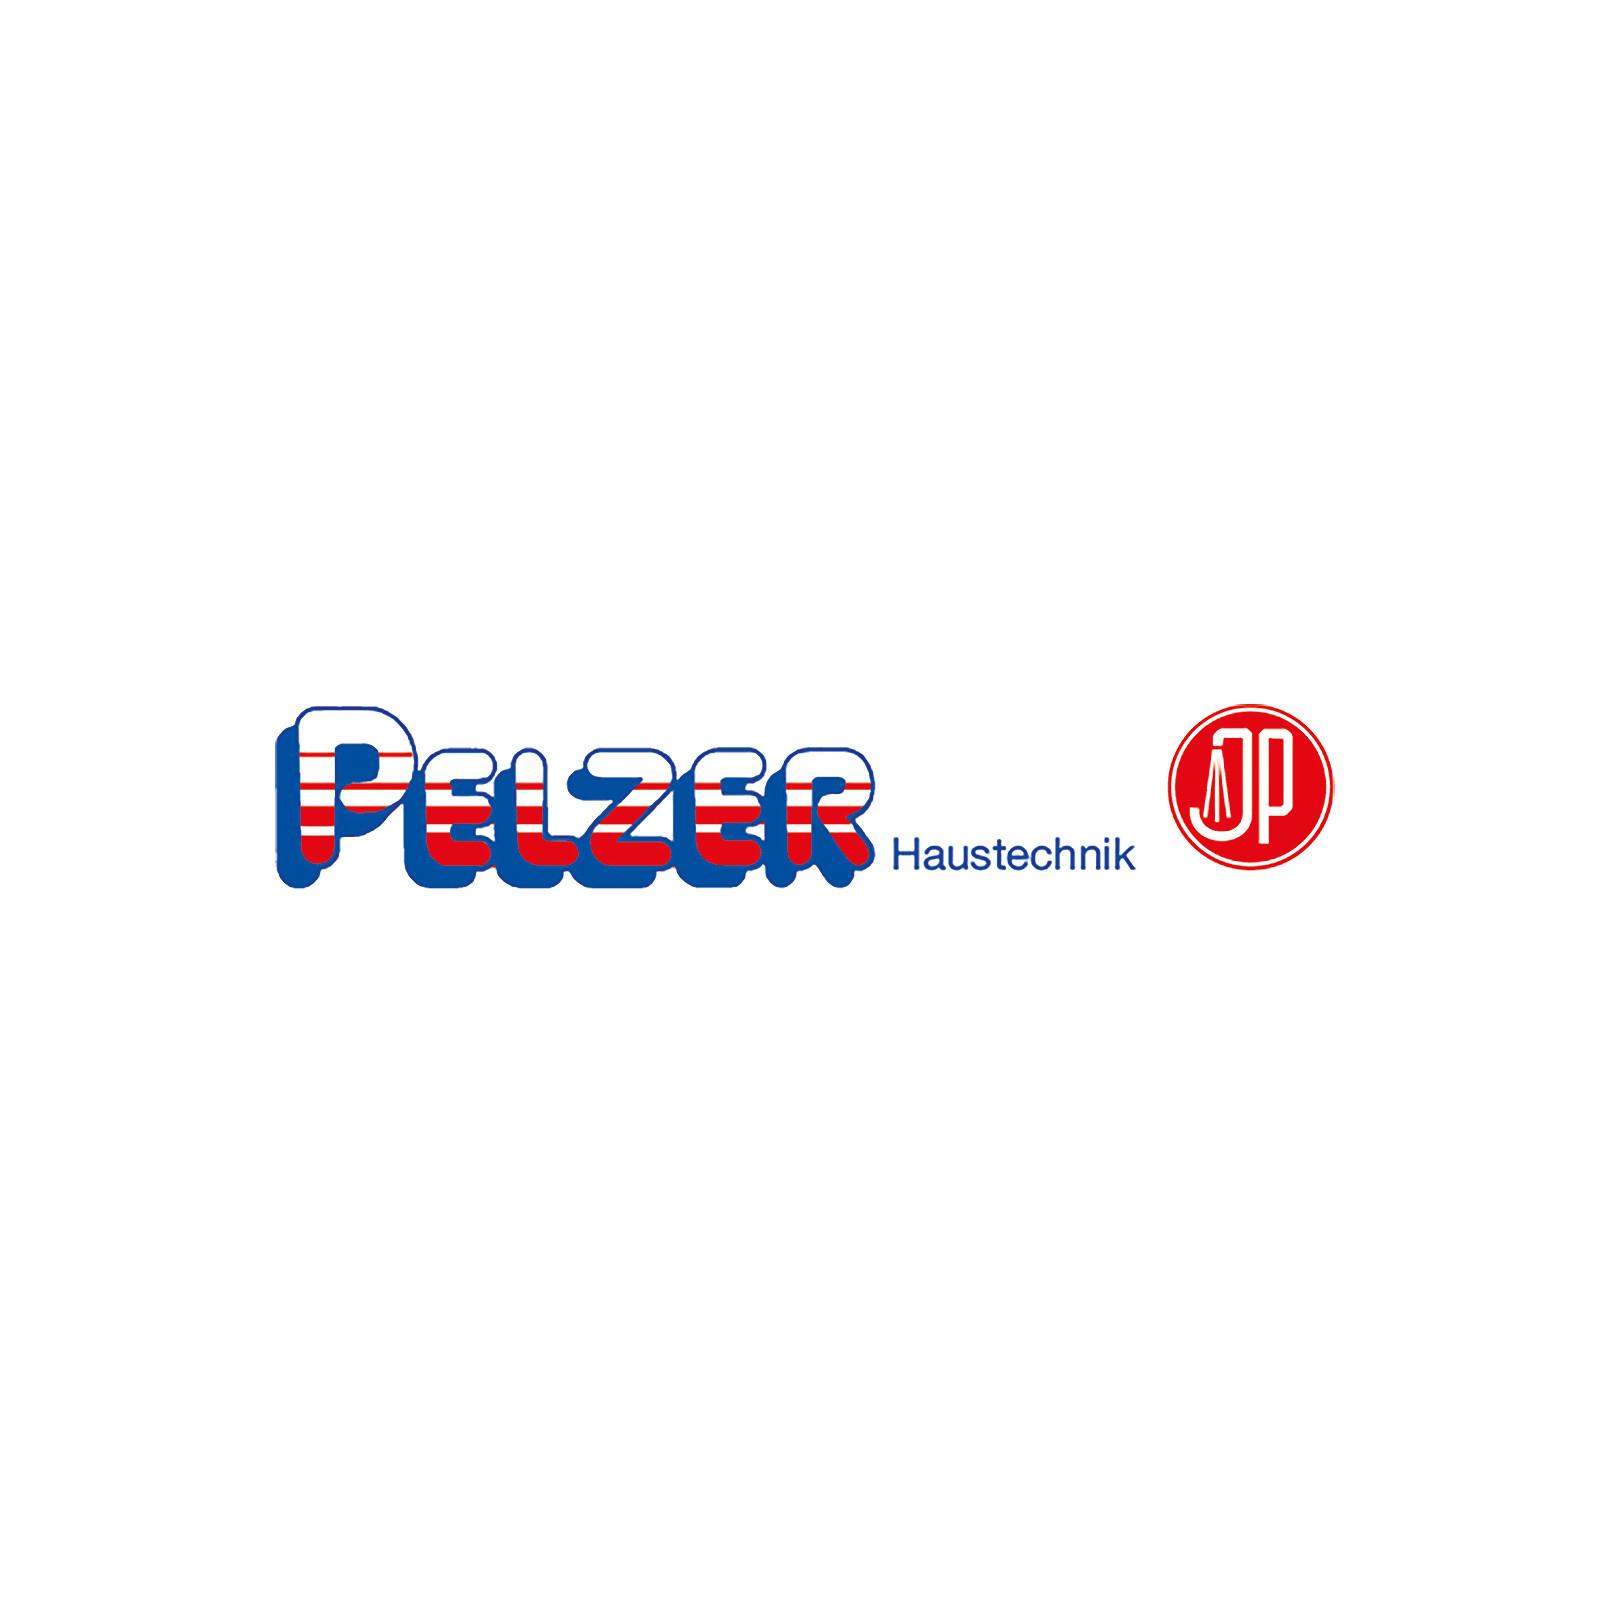 Pelzer Haustechnik GmbH